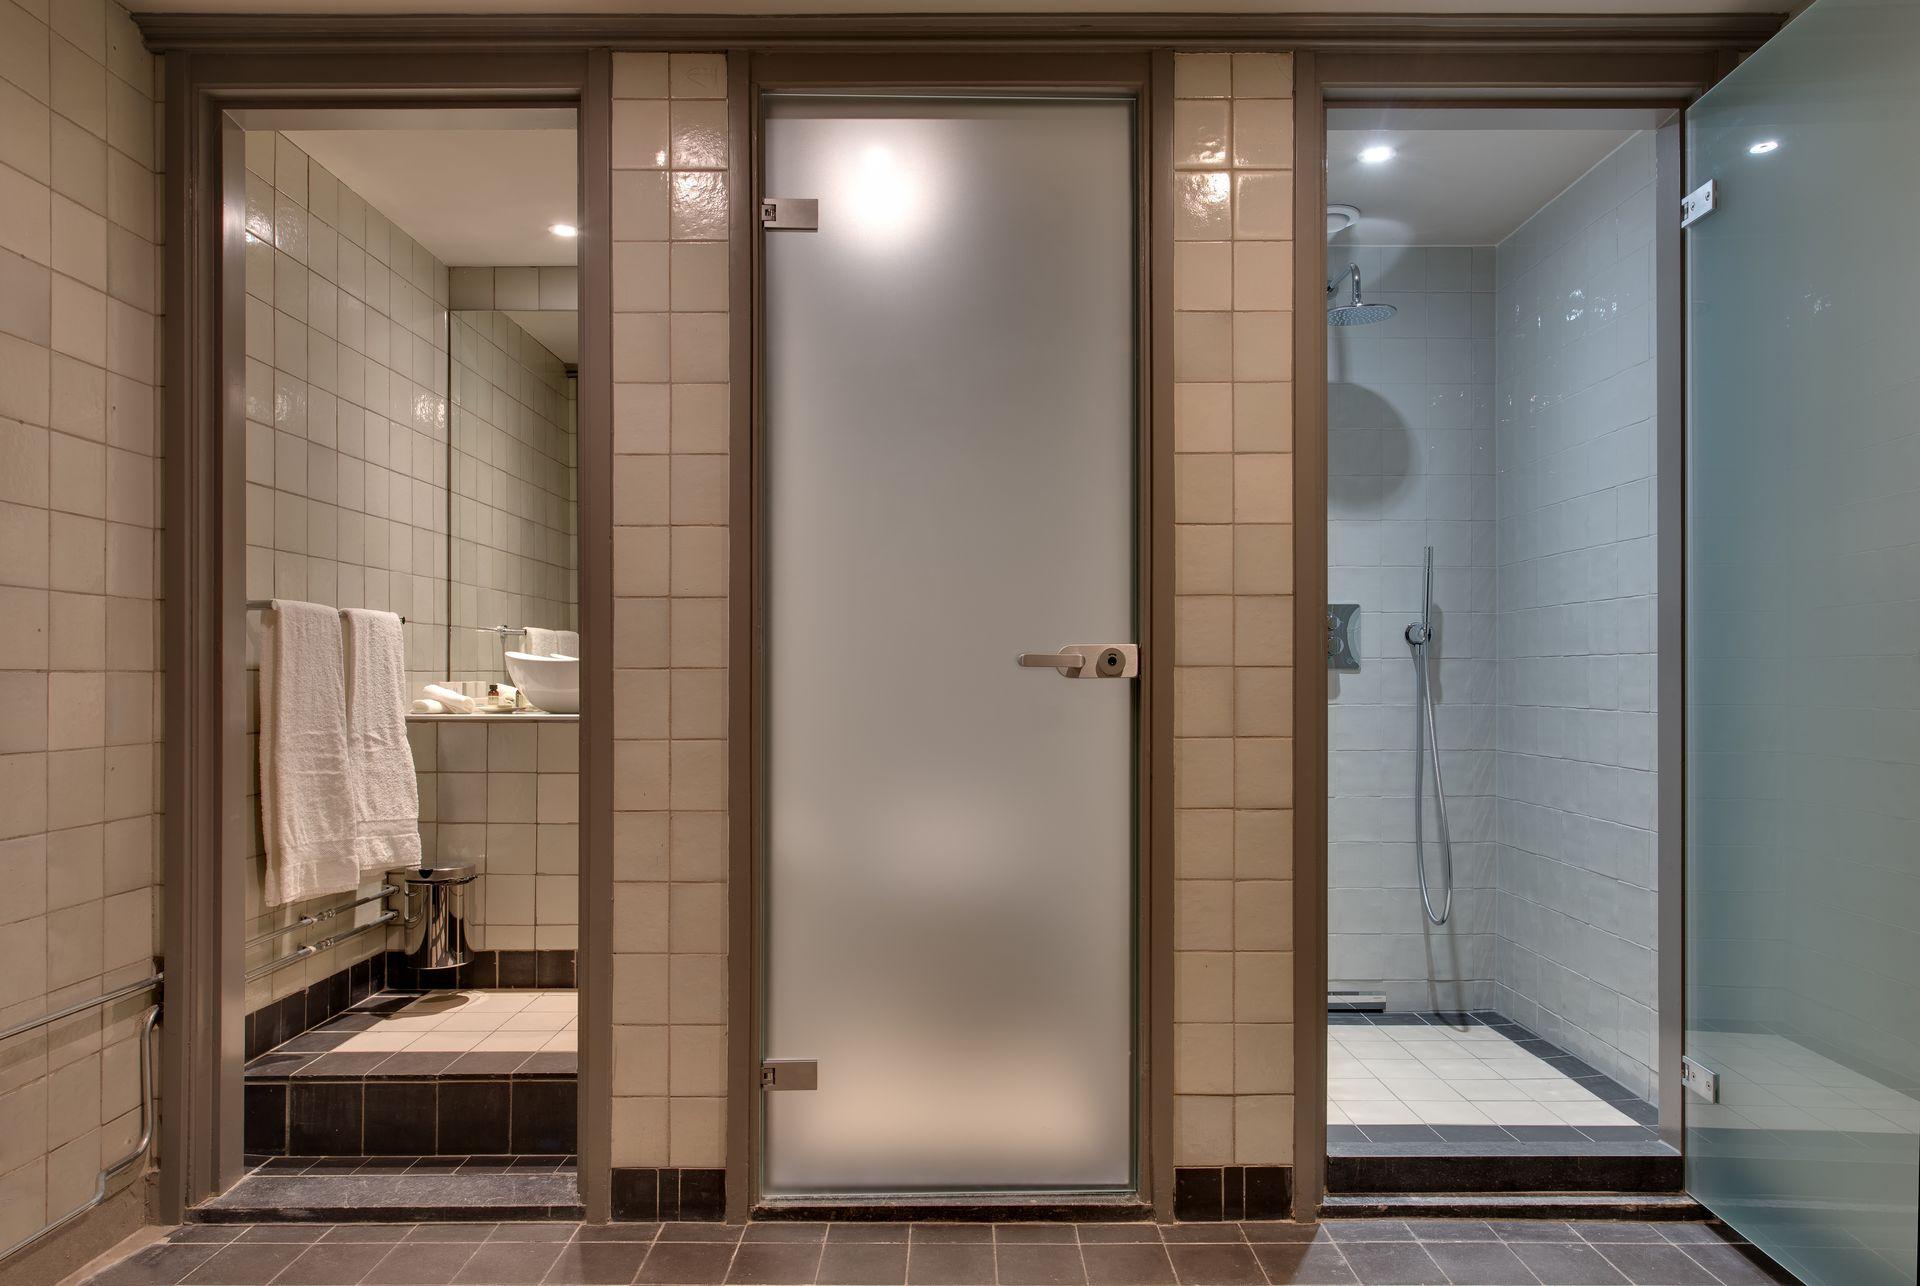 tranquilo-estida-hotel-the-roosevelt-middelburg-bad-toilet